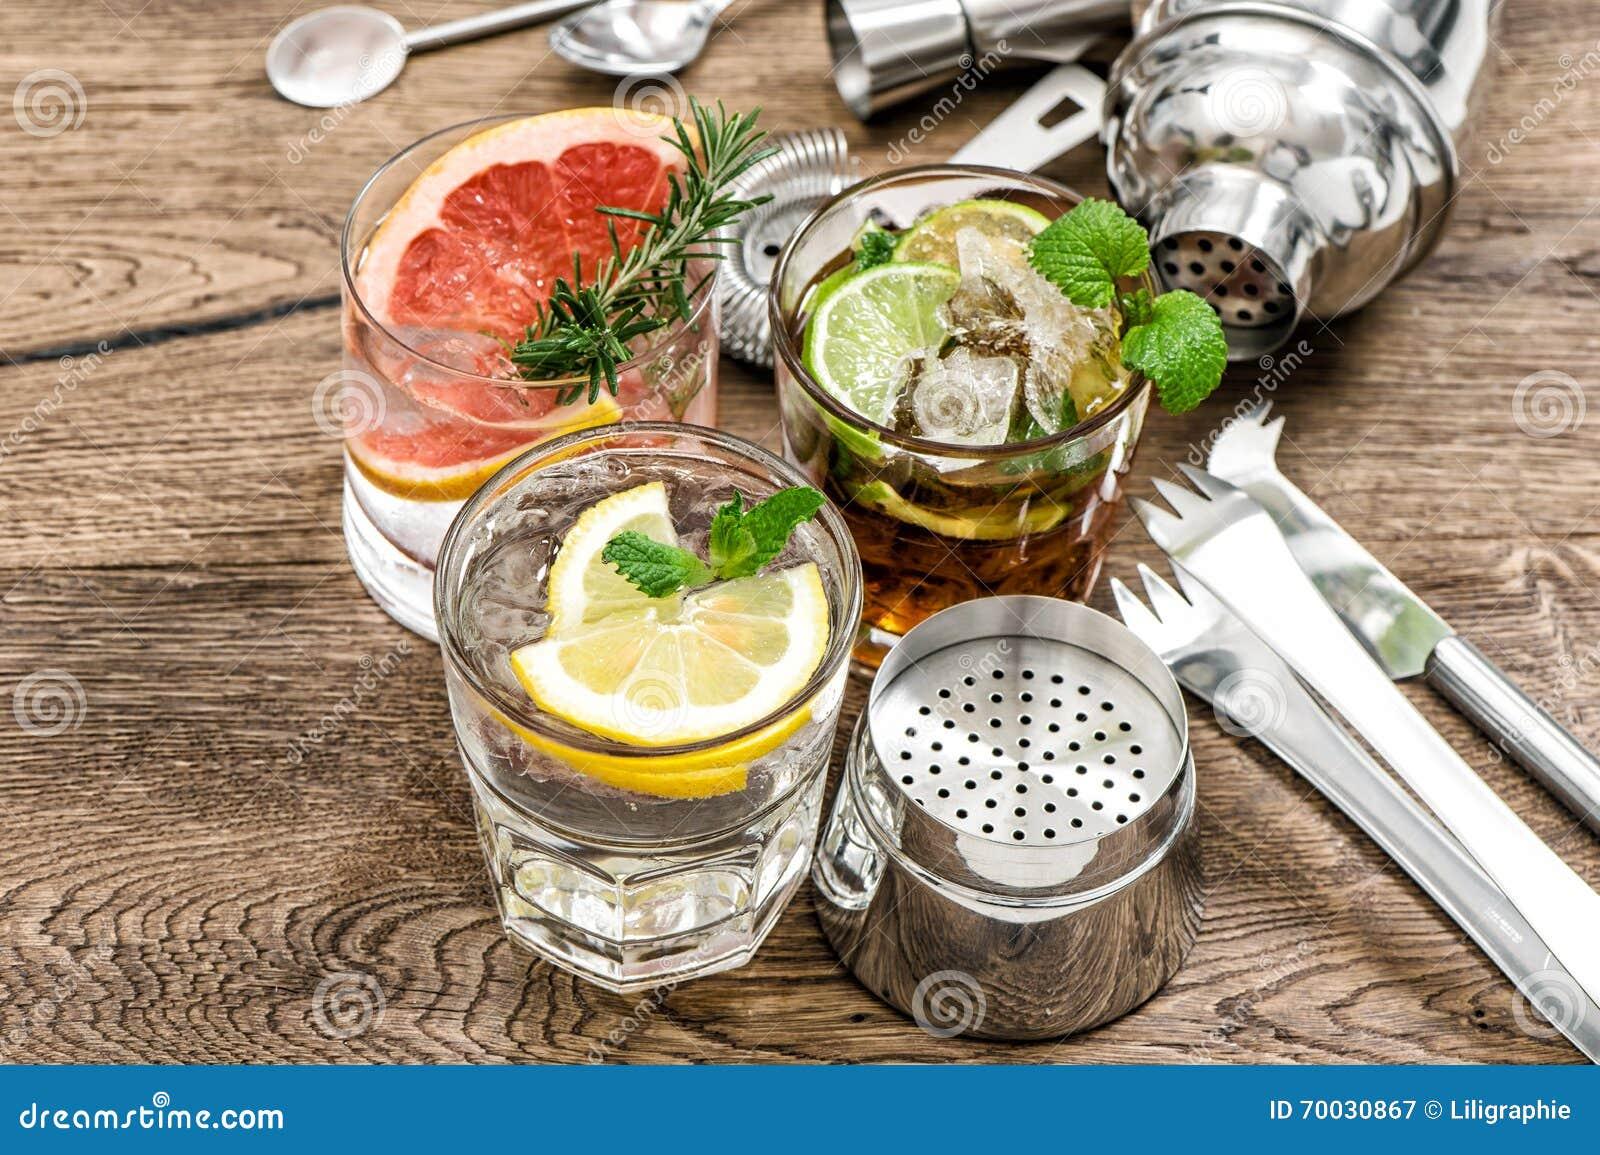 Fruit drinks Cocktail making bar tools, shaker, glasses